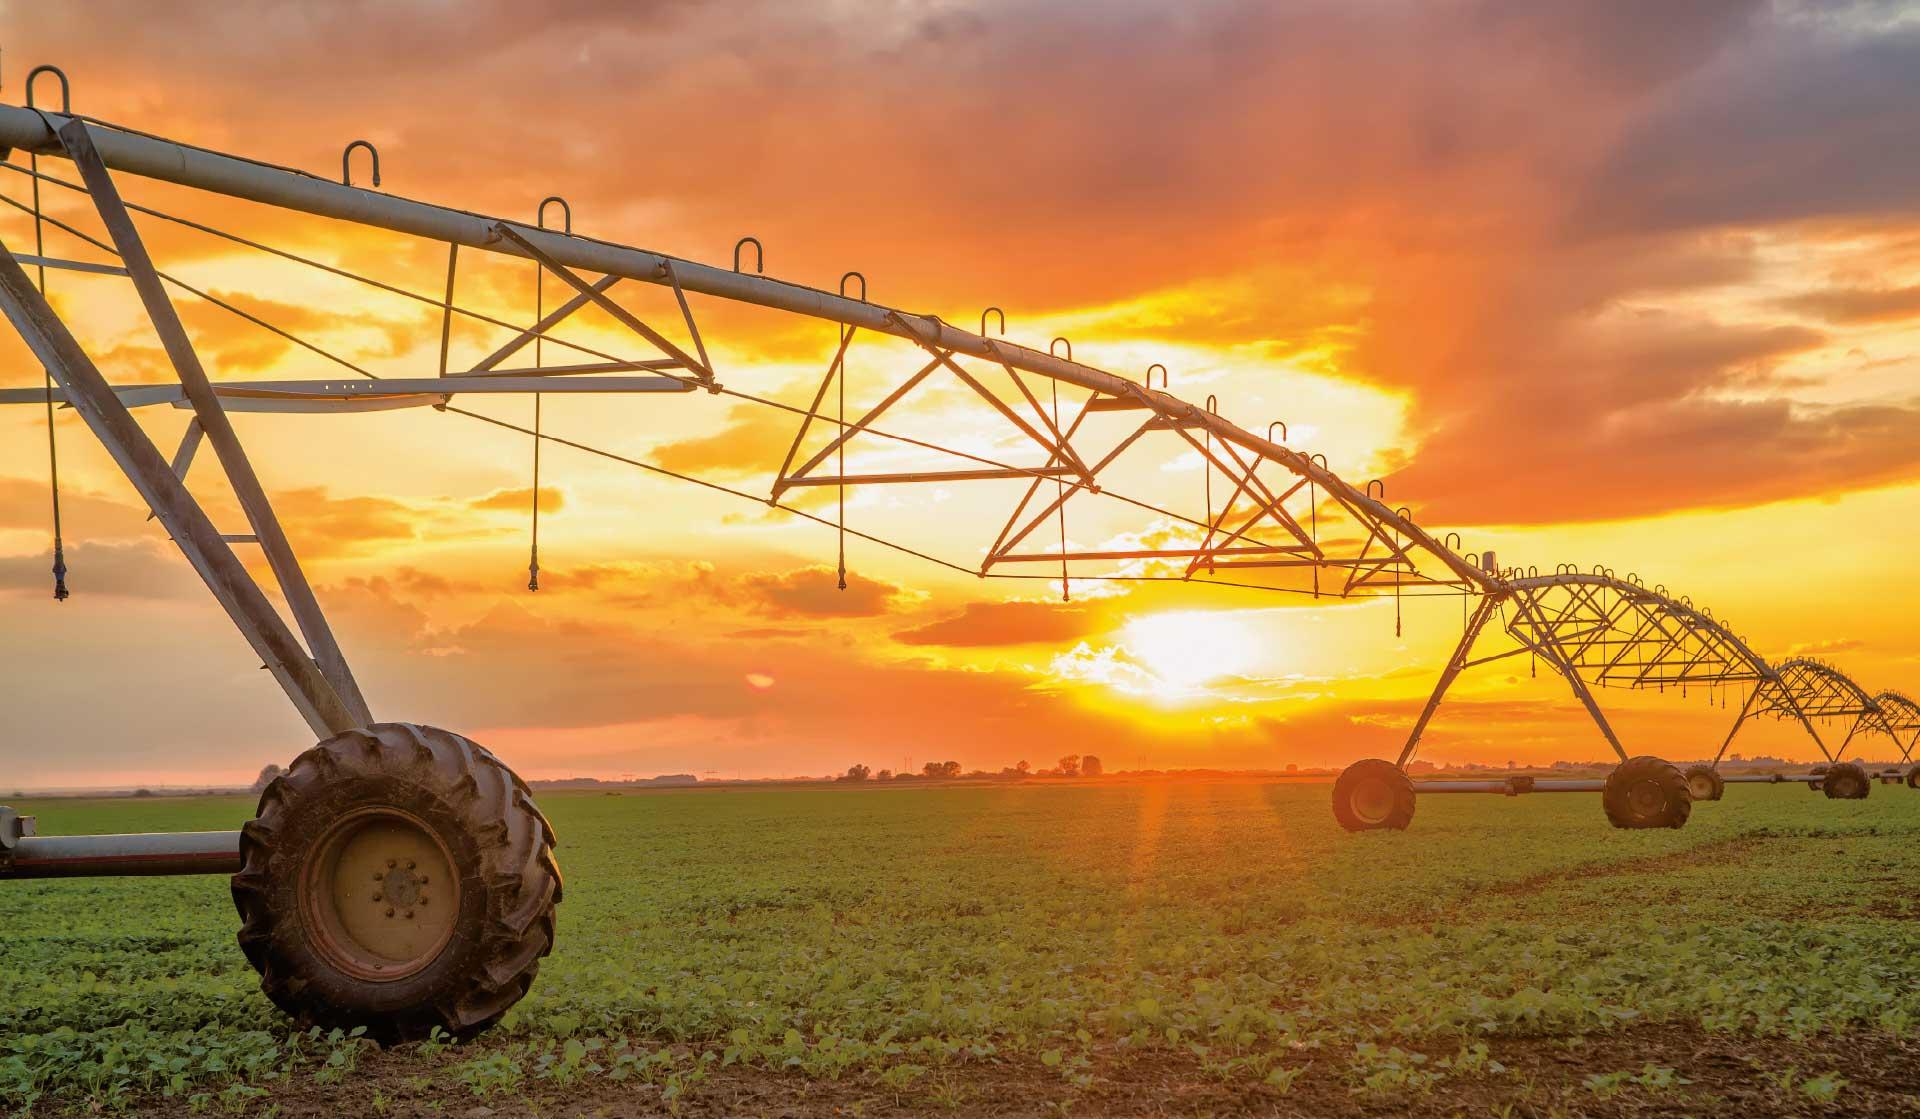 01.16 agricoltura 4.0 irrigazione veneta